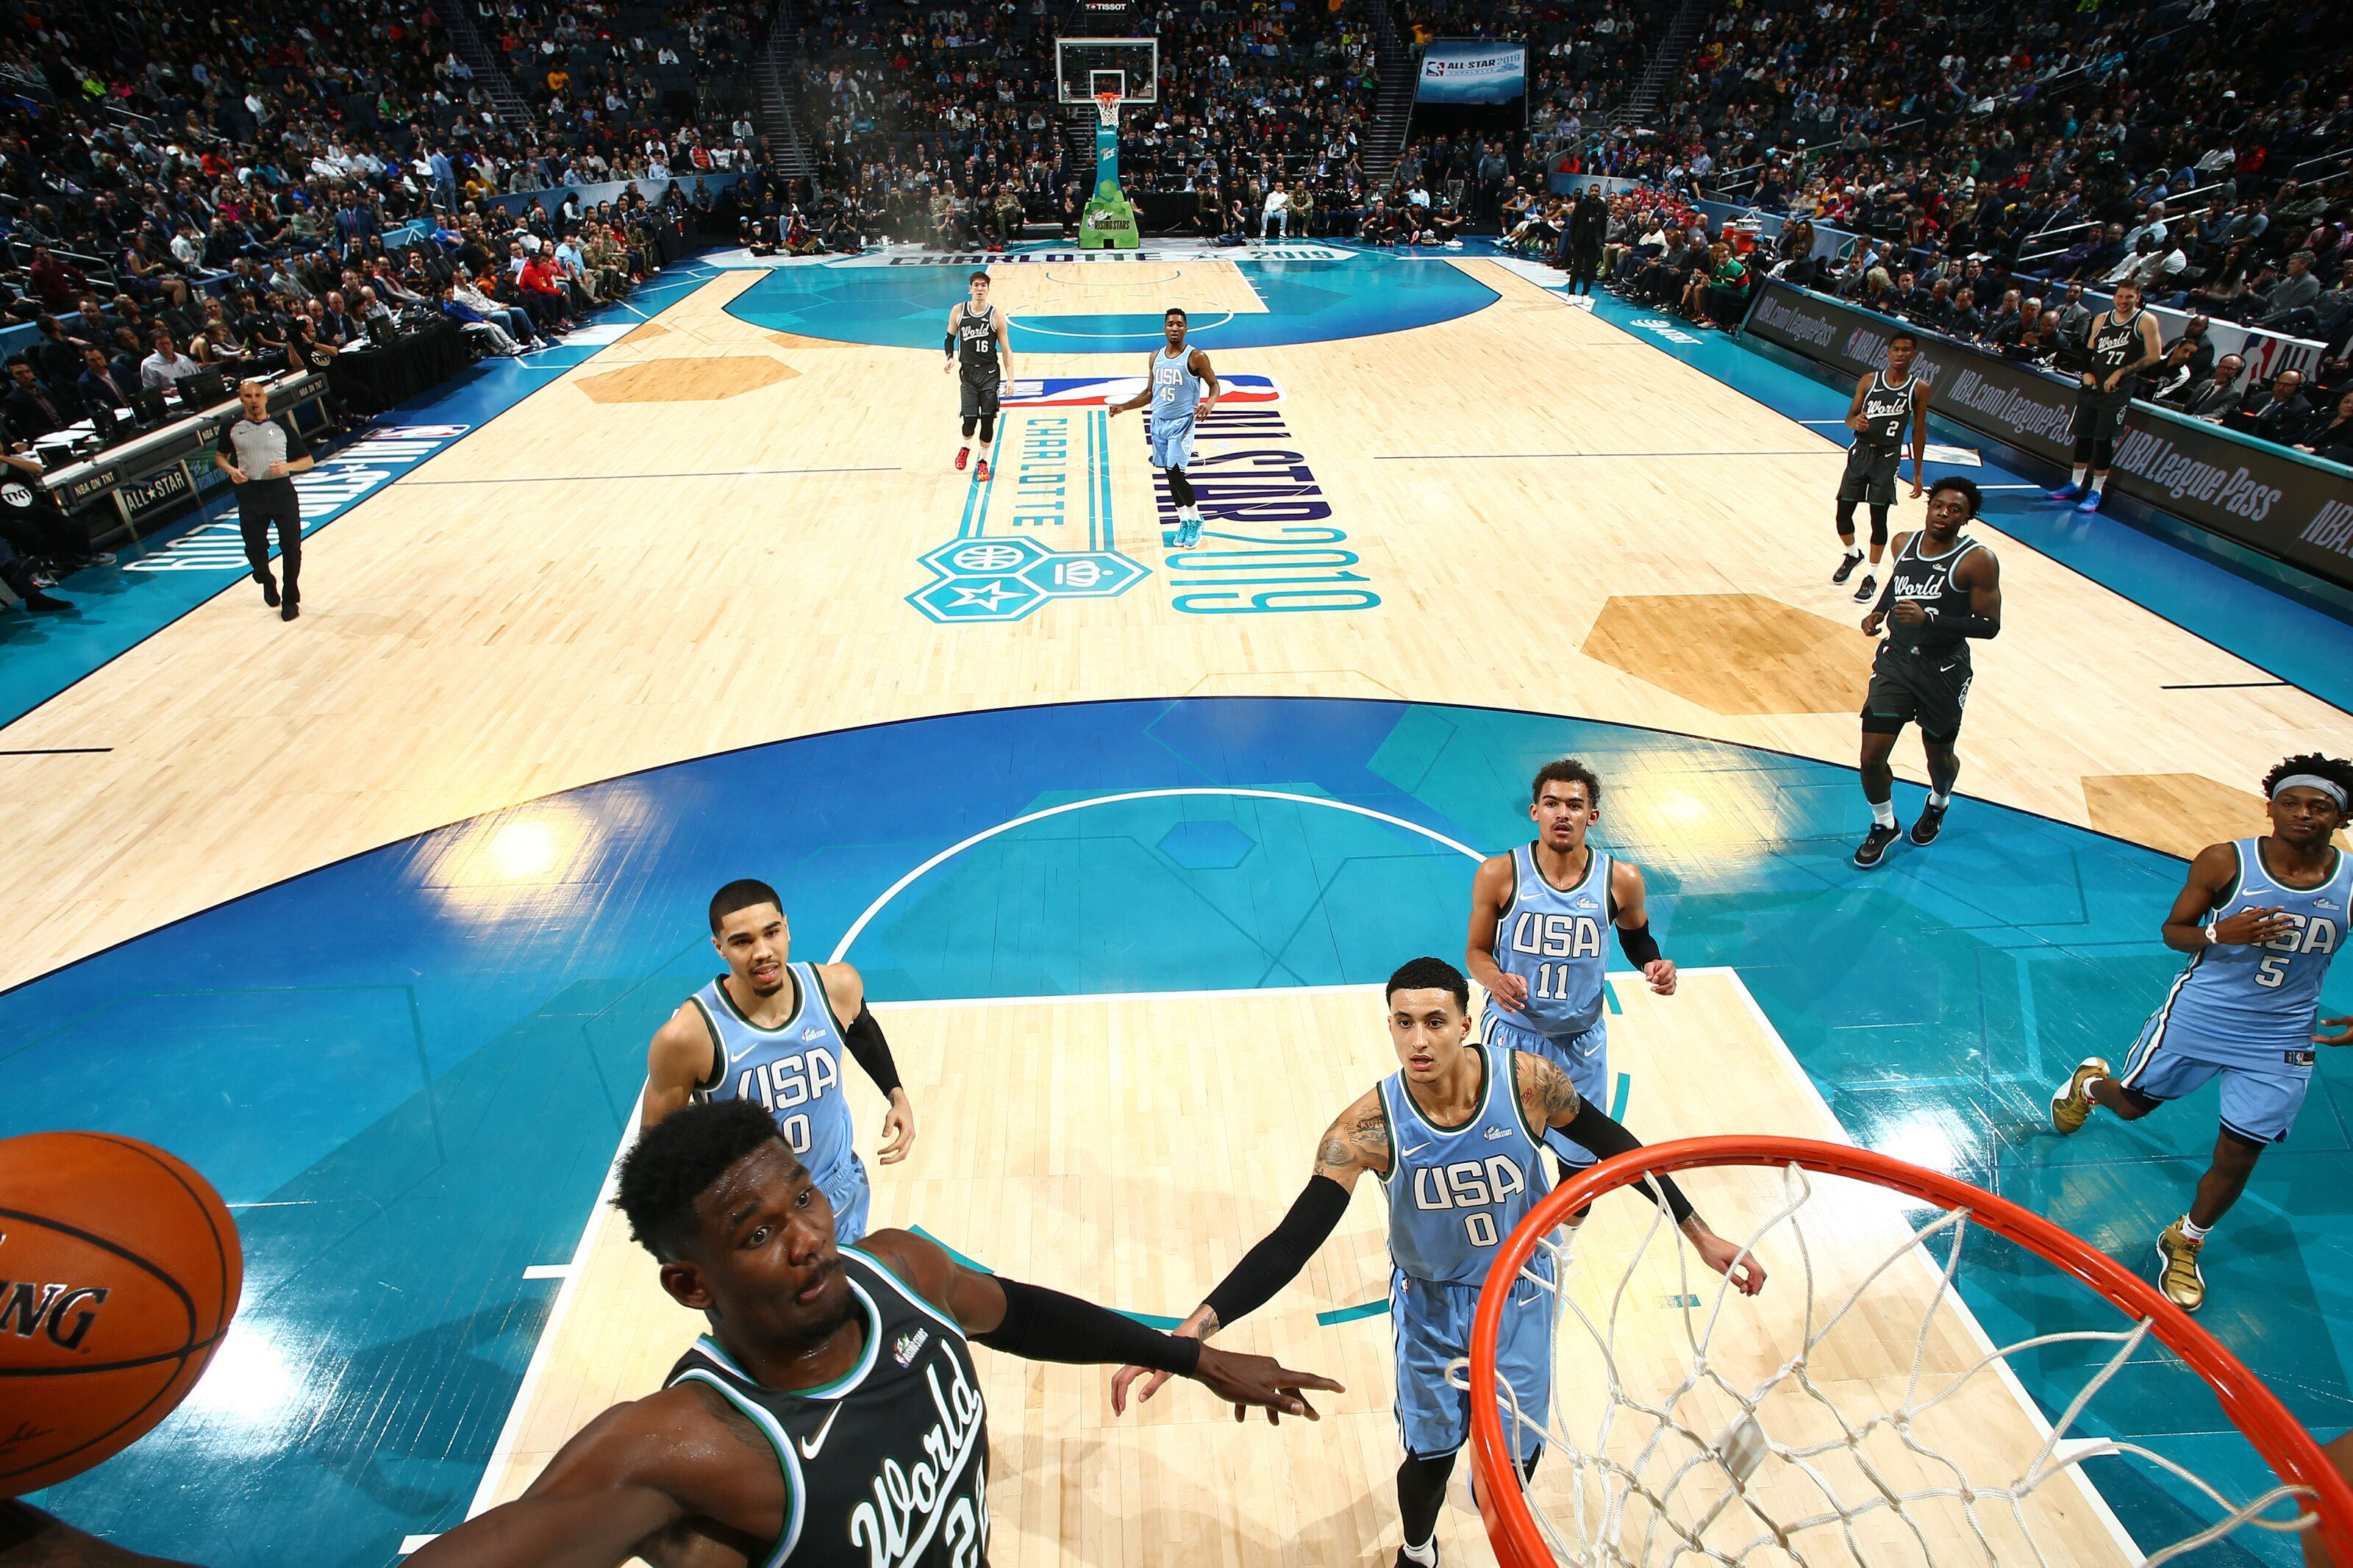 Phoenix Suns: Analyzing Deandre Ayton's performance in the Rising Stars Challenge